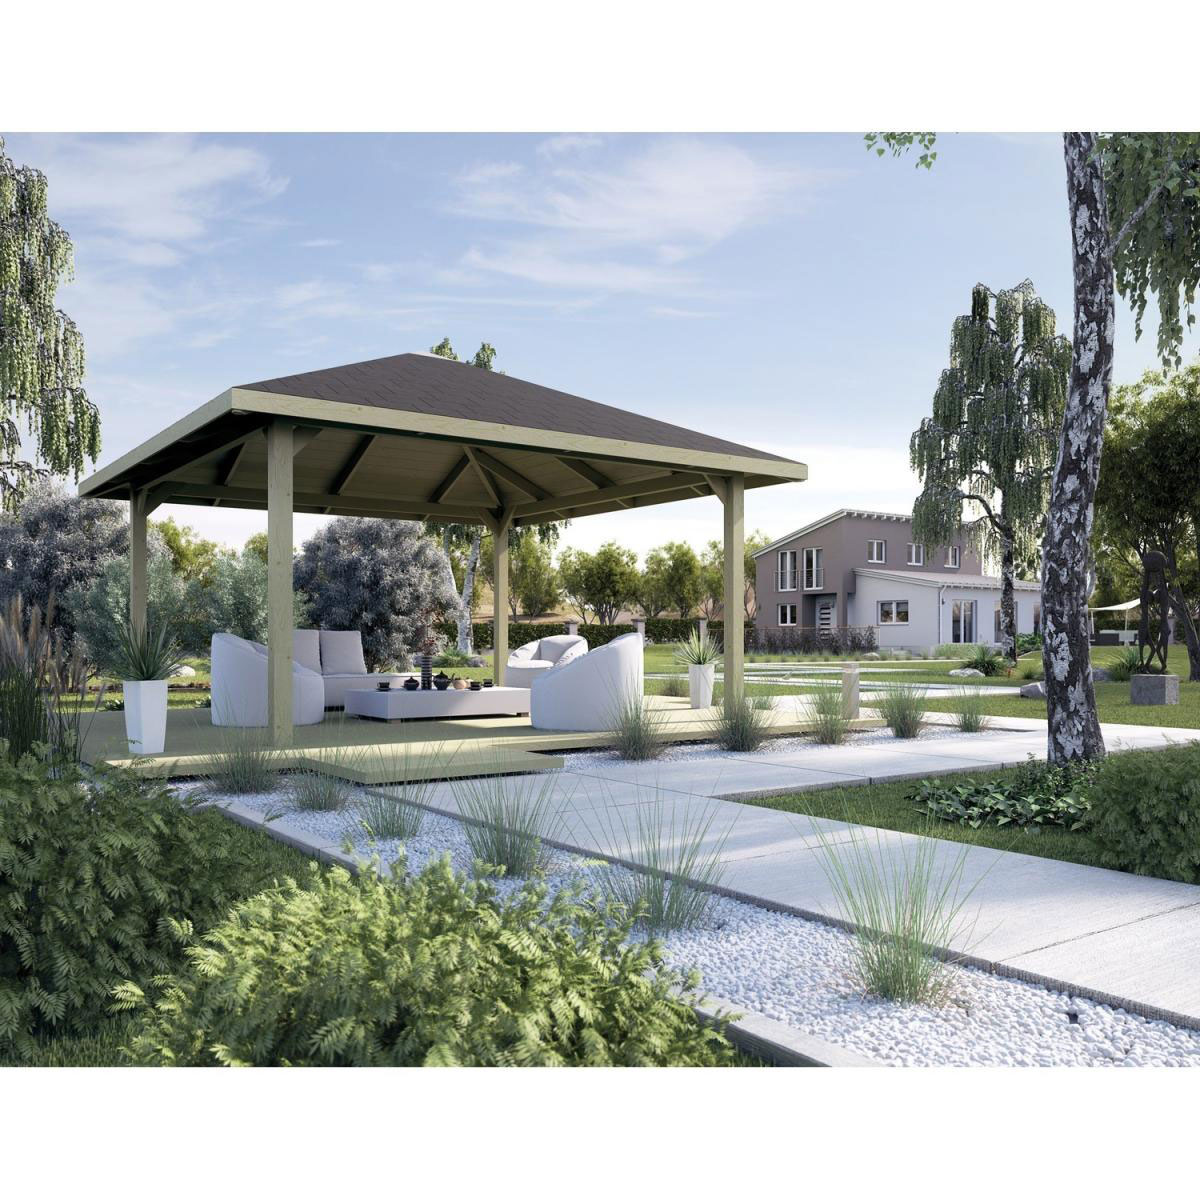 "Pavillons - Holzpavillon ""651 A"" Gr.1 2, 480x480x204 cm 480x480x204 cm  - Onlineshop Hellweg"